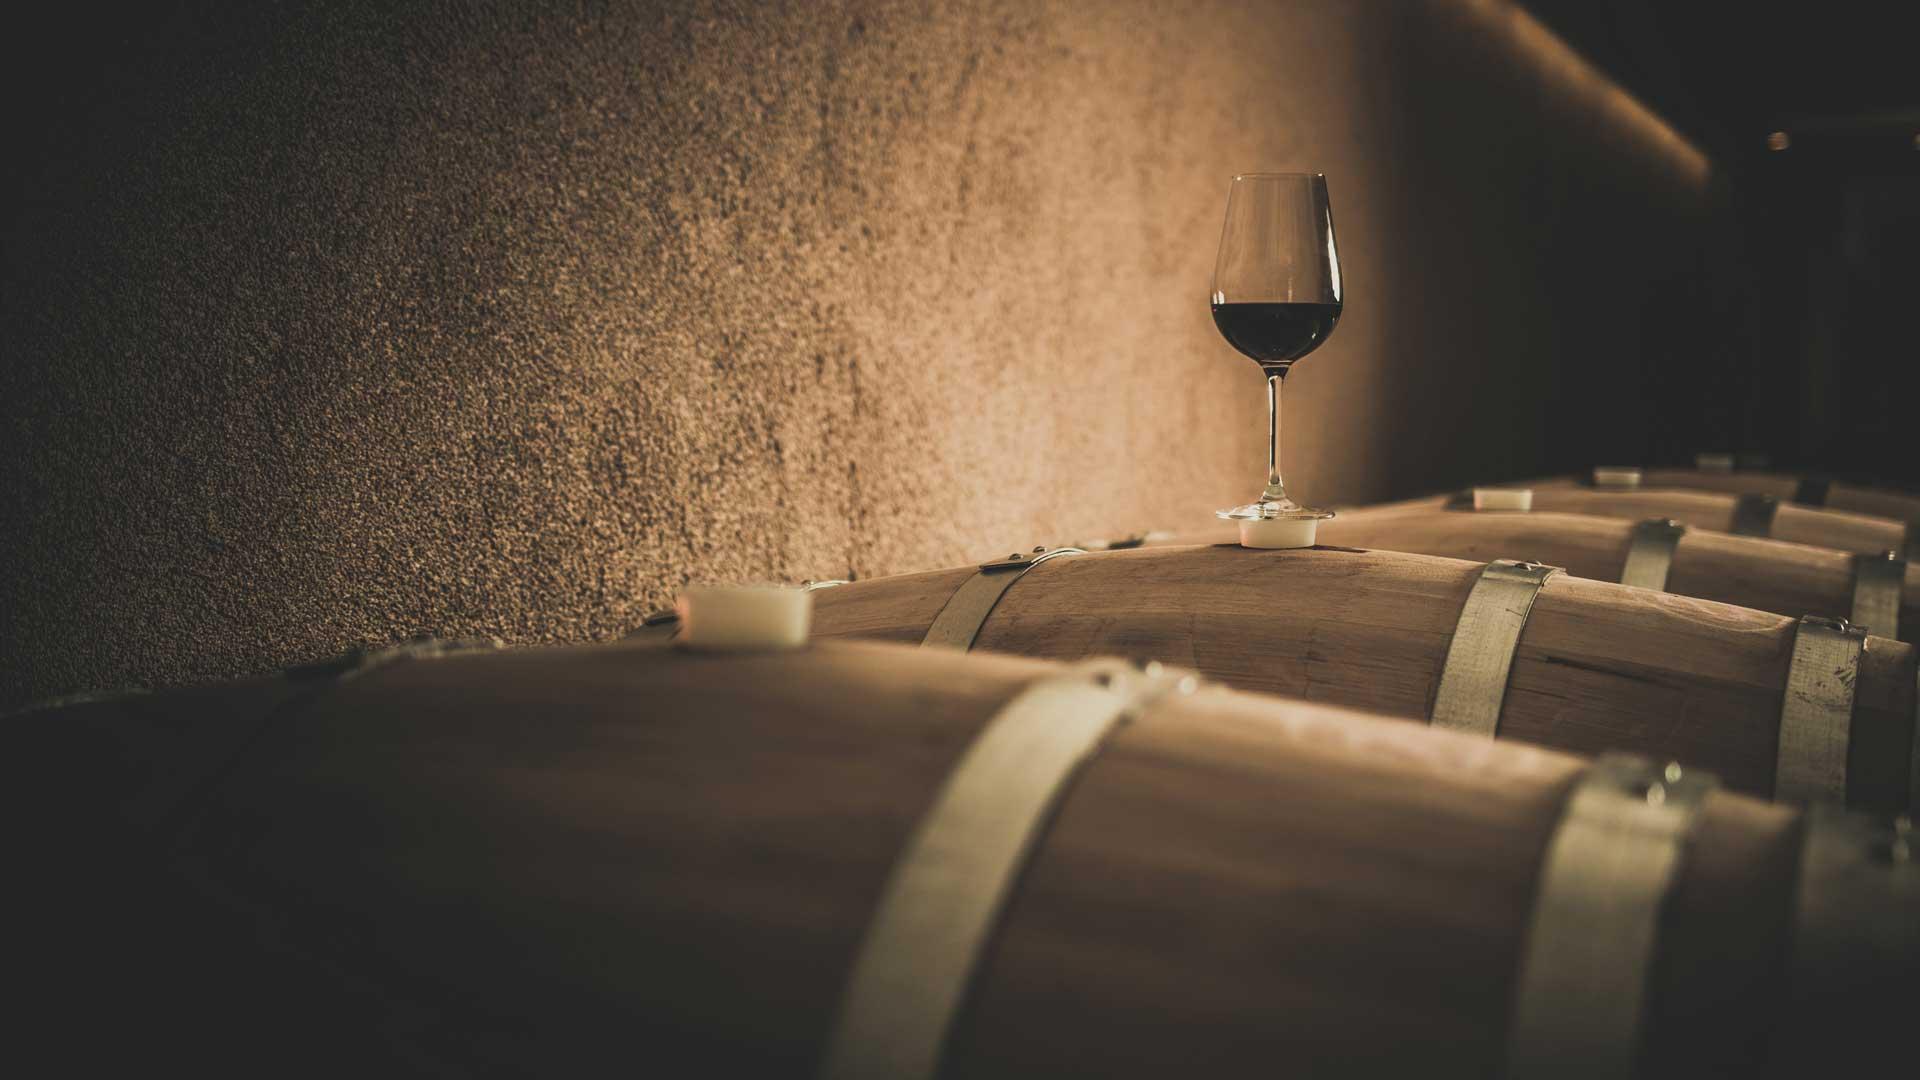 vinarija sapat podrum